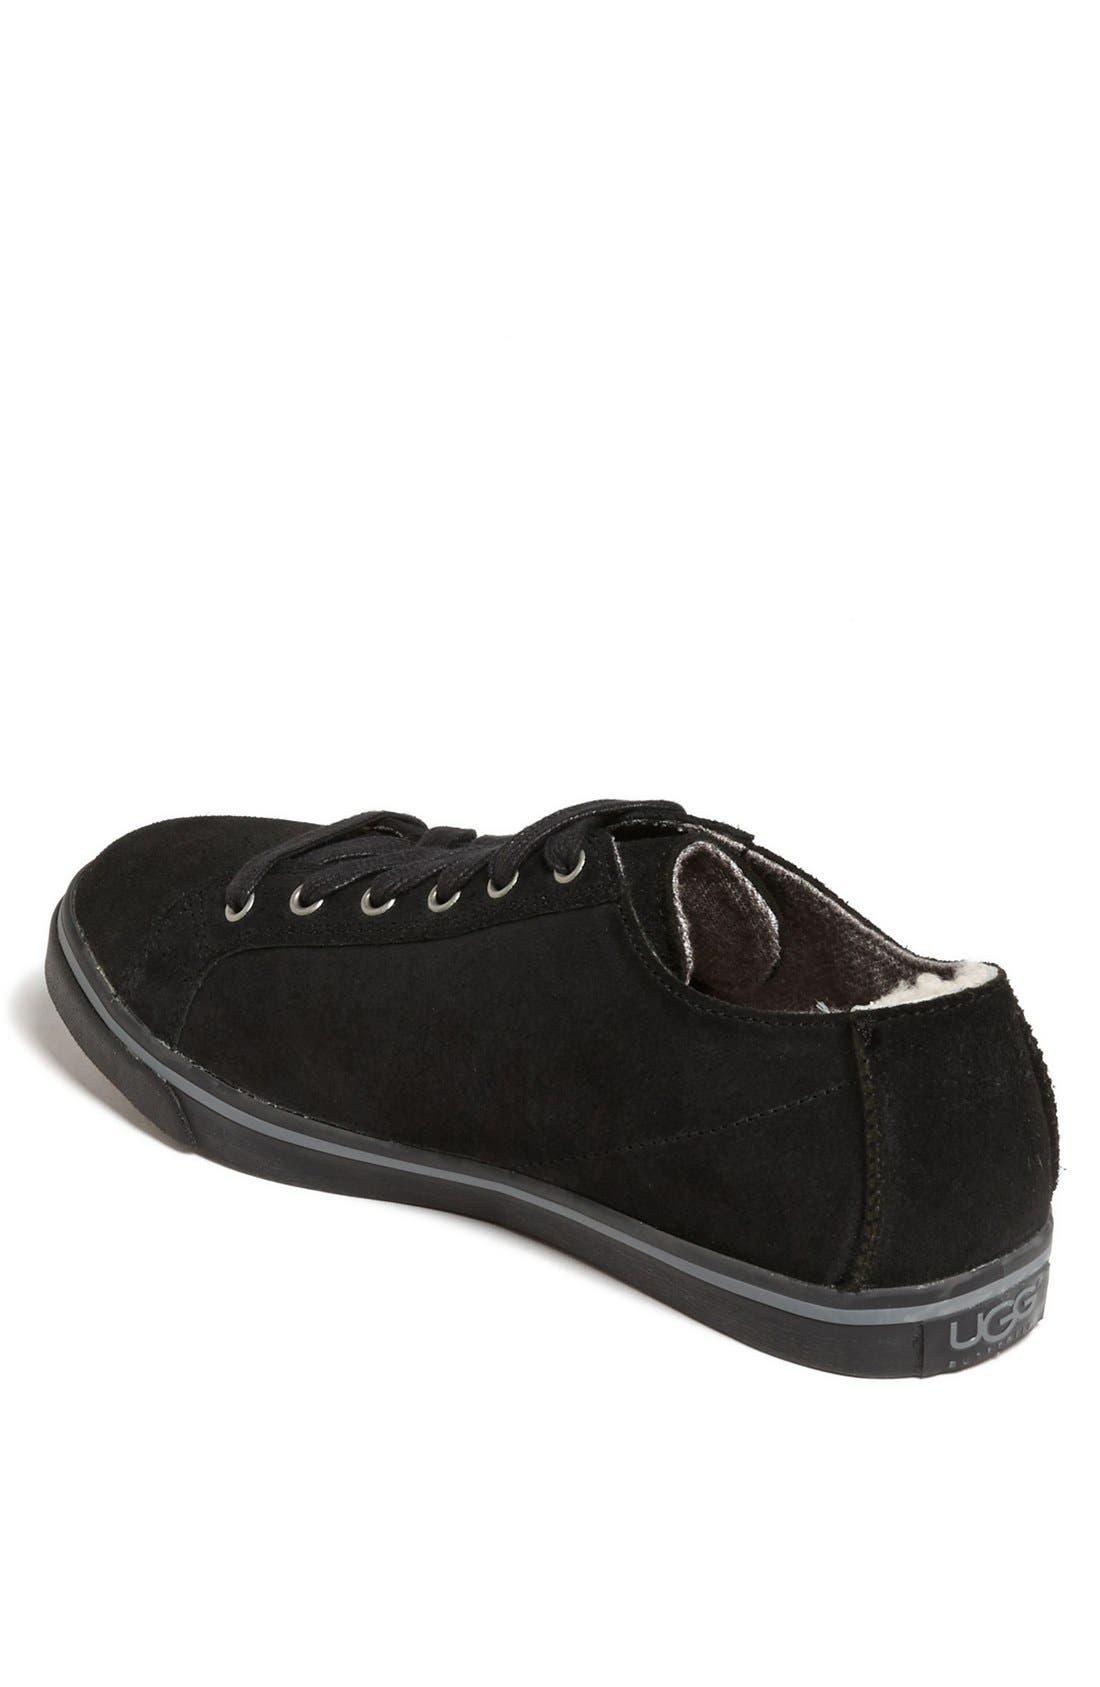 Australia 'Vanowen' Sneaker,                             Alternate thumbnail 2, color,                             001